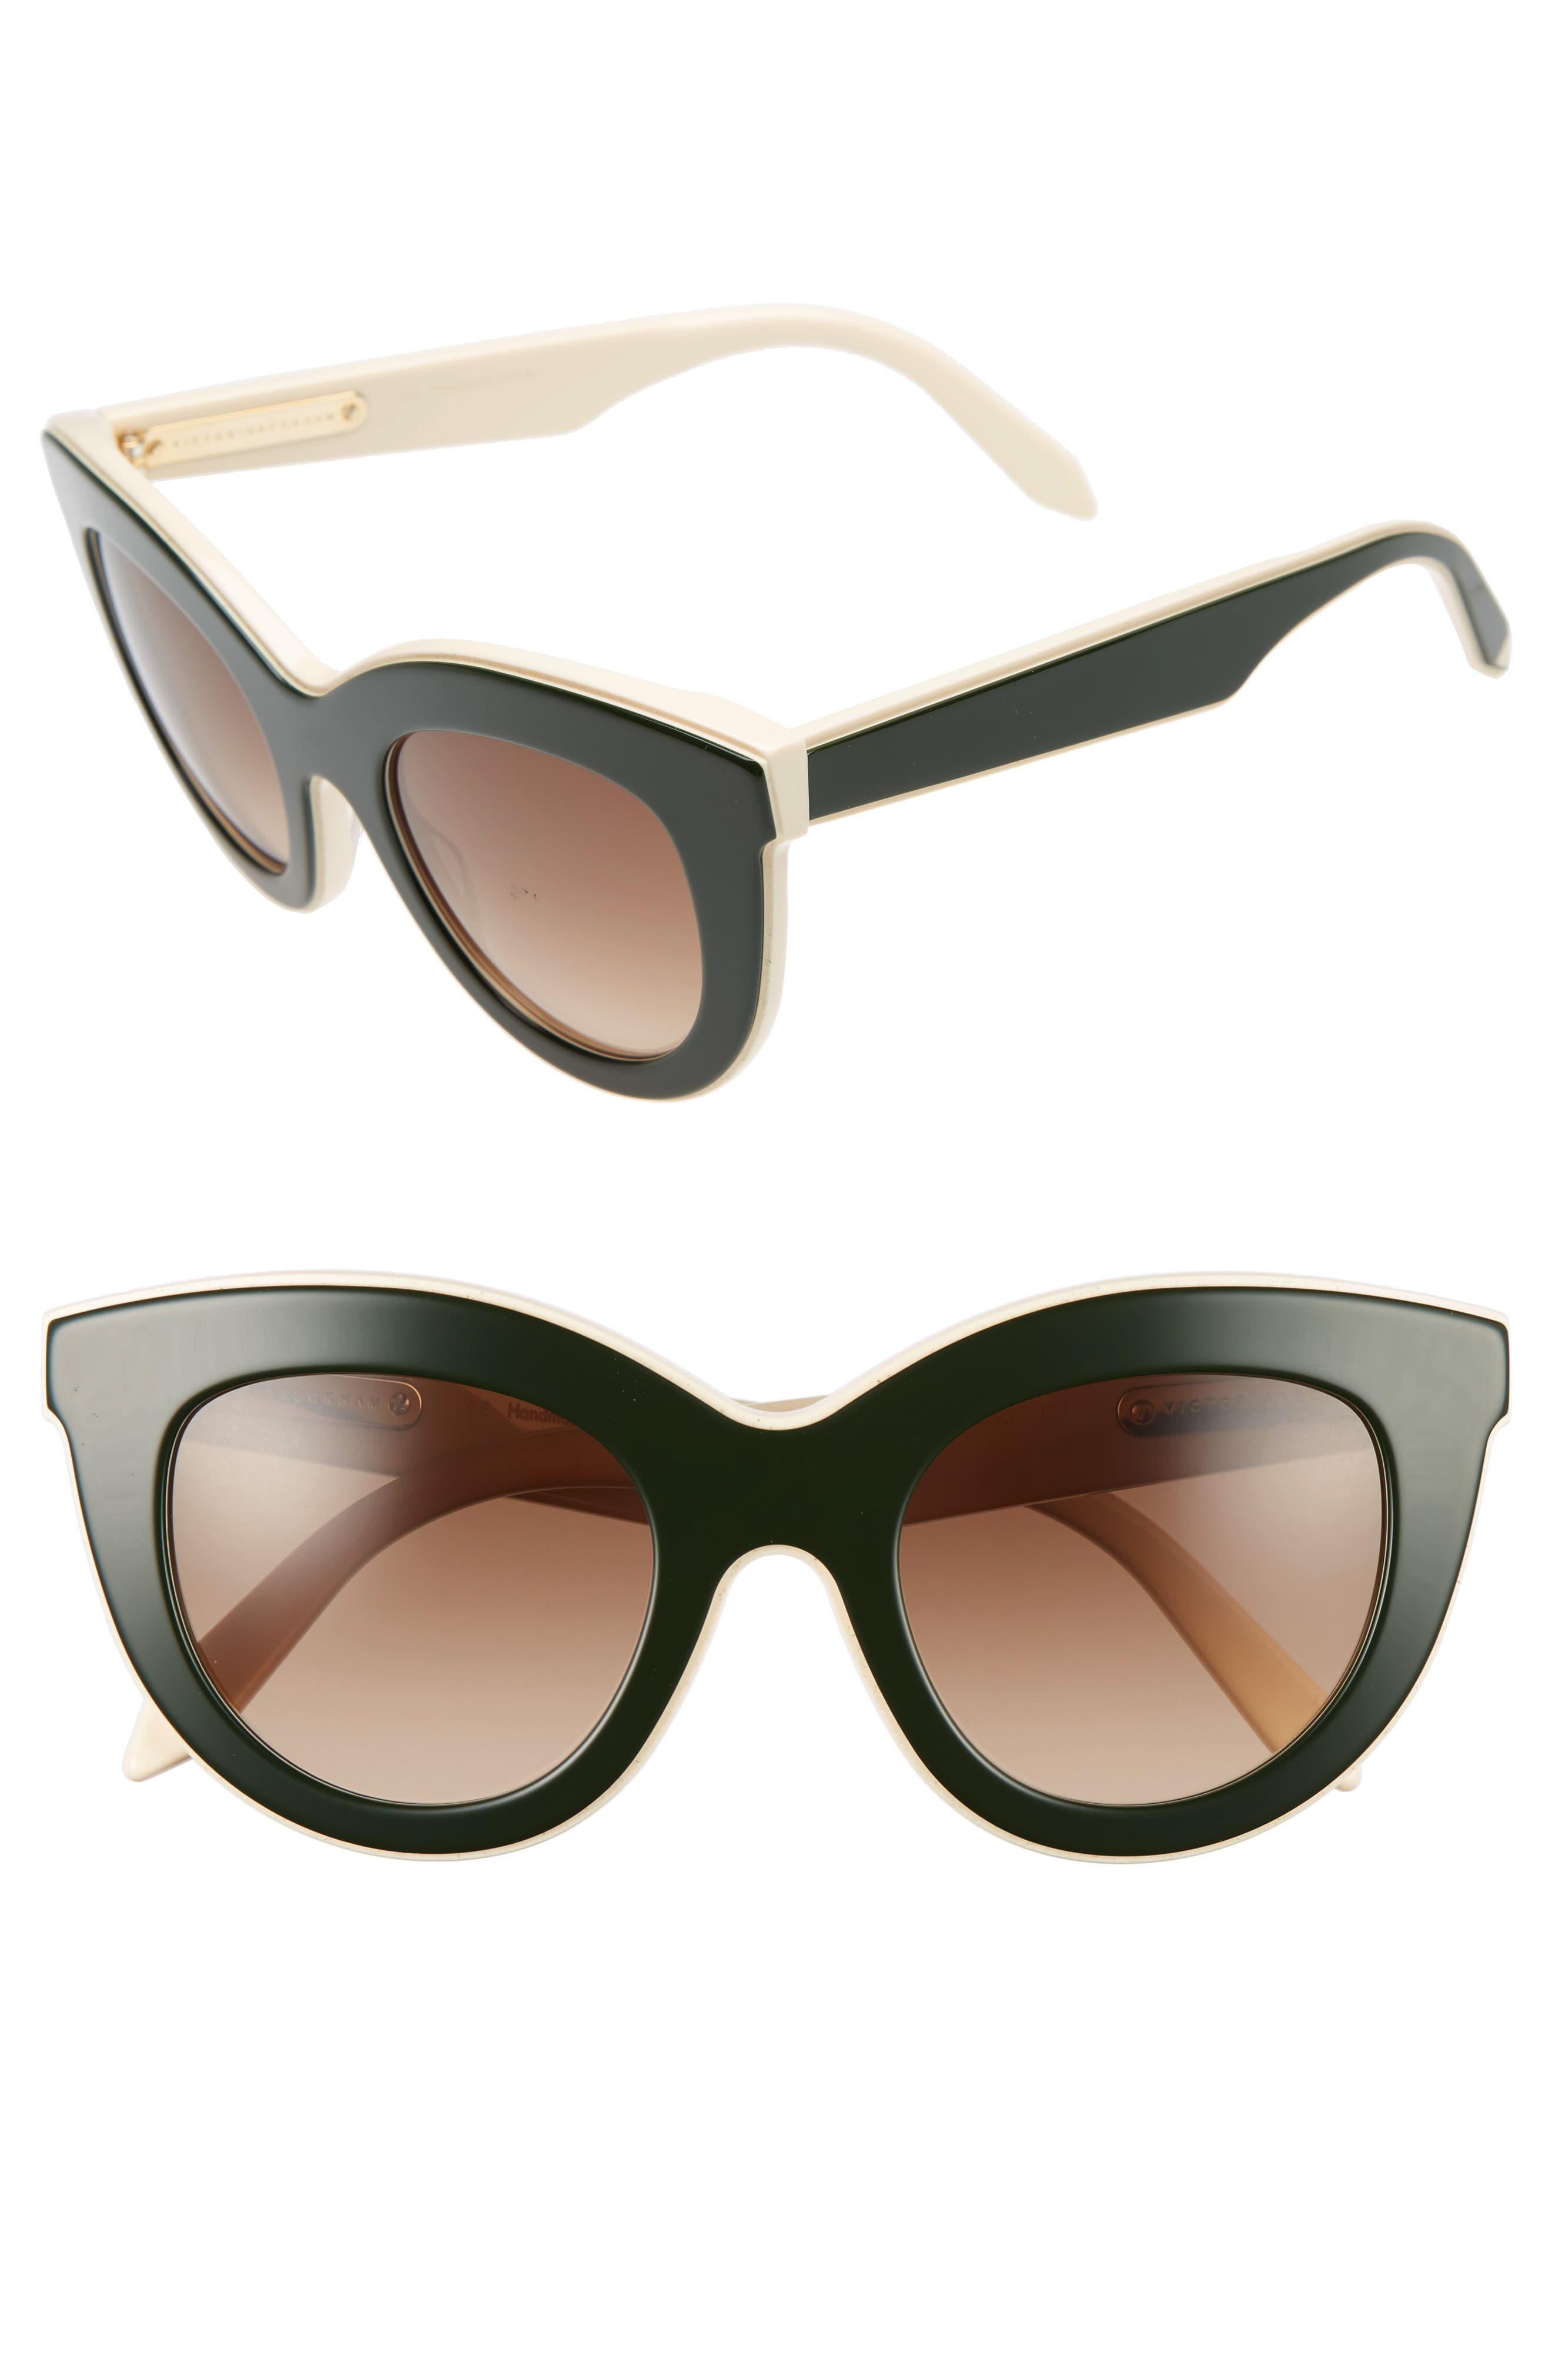 Victoria Beckham 49mm Cat Eye Sunglasses